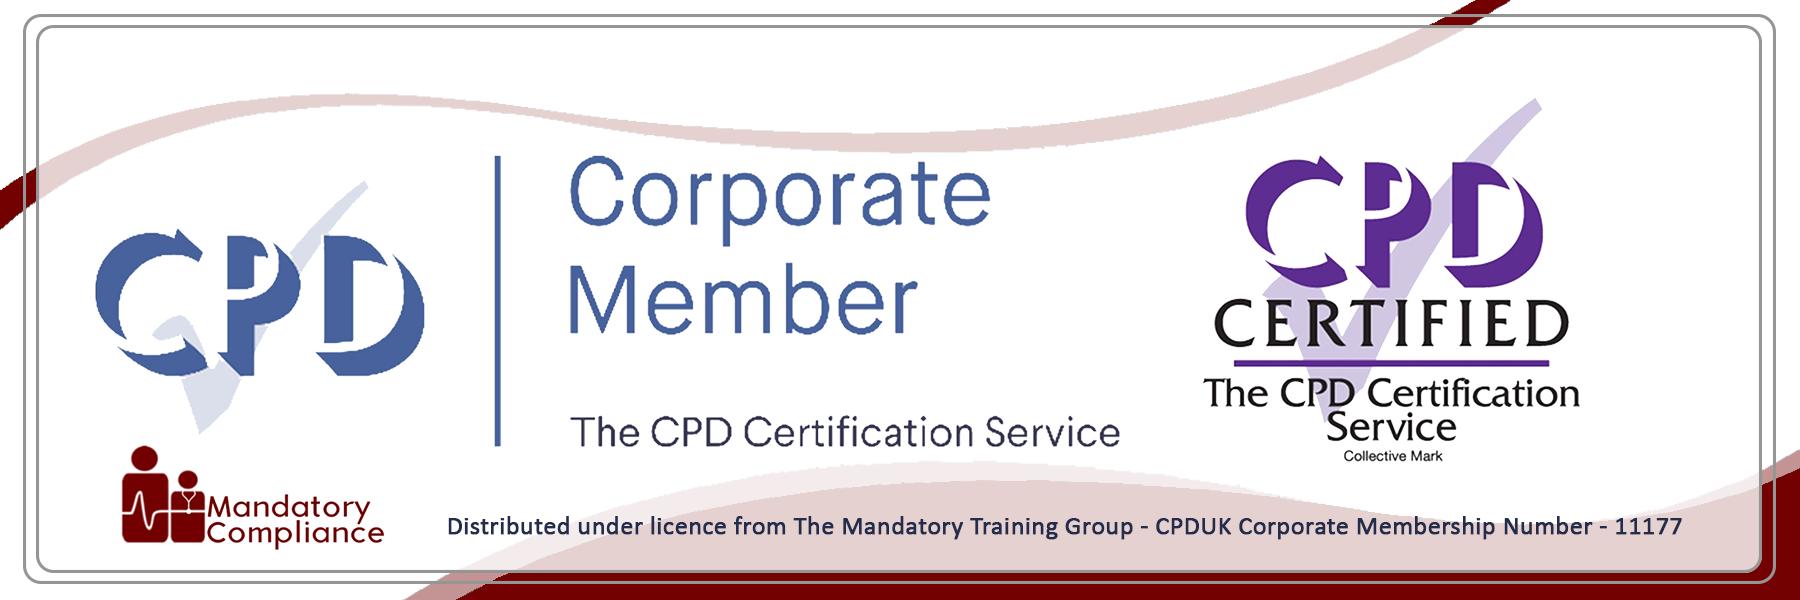 Understanding Stress - Online Training Courses - Mandatory Compliance UK -